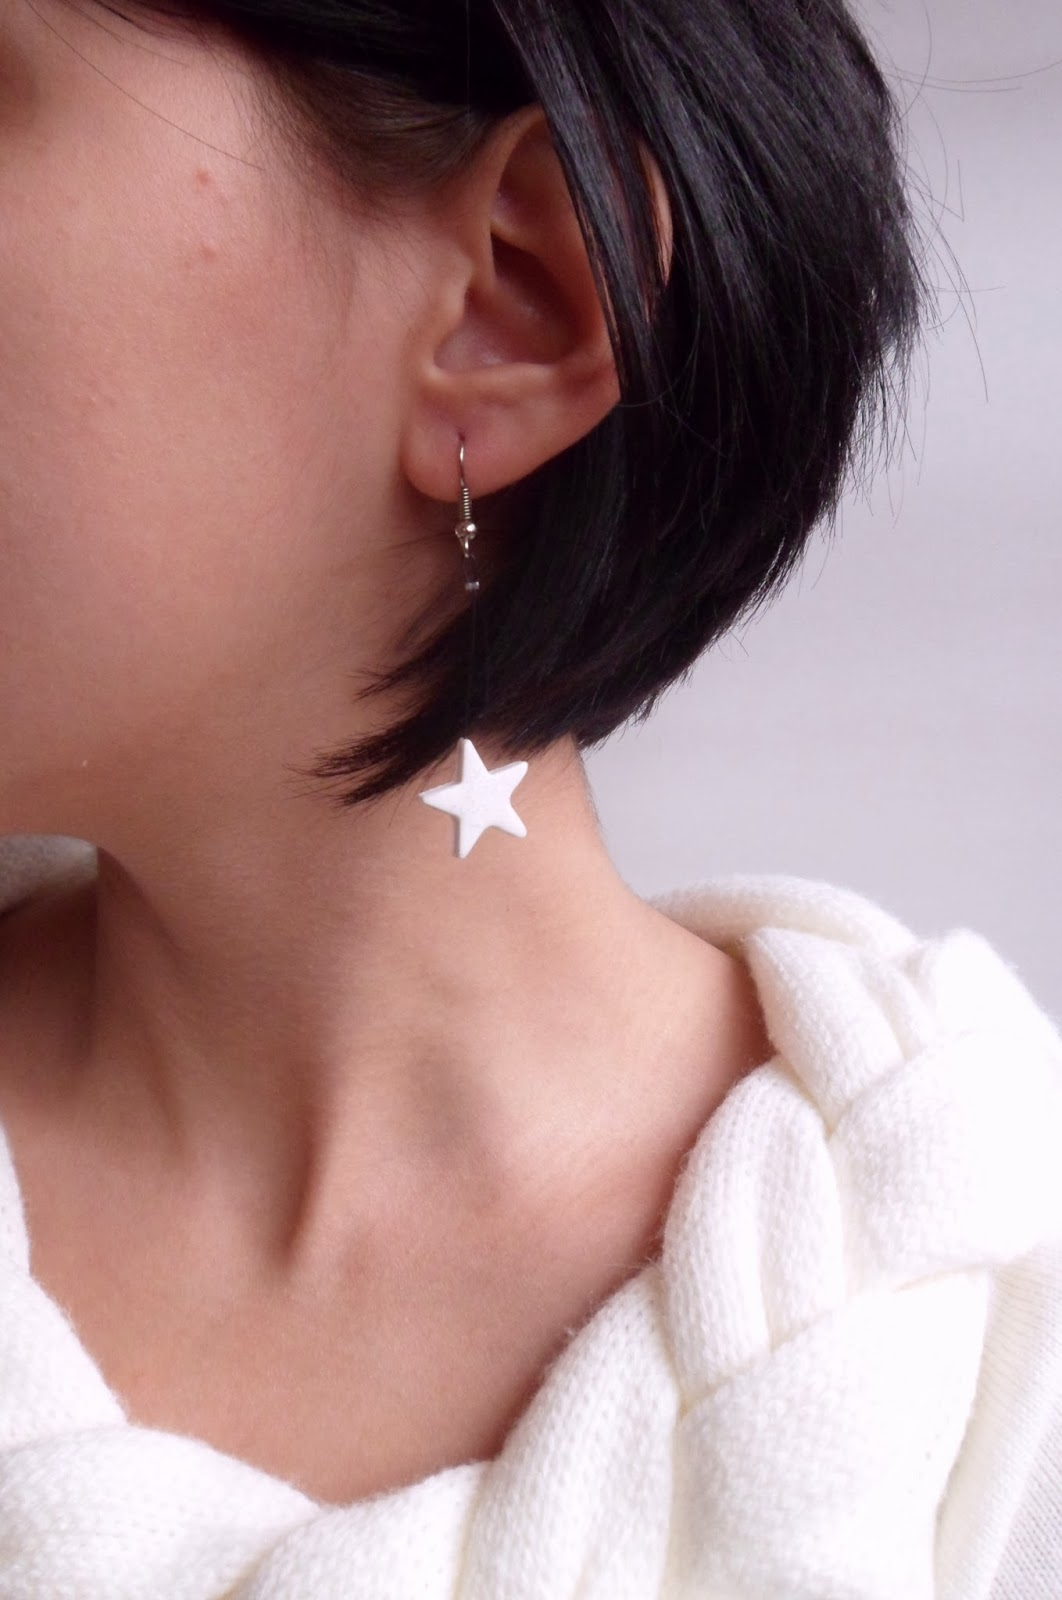 Cercei stelute albe - pe anou